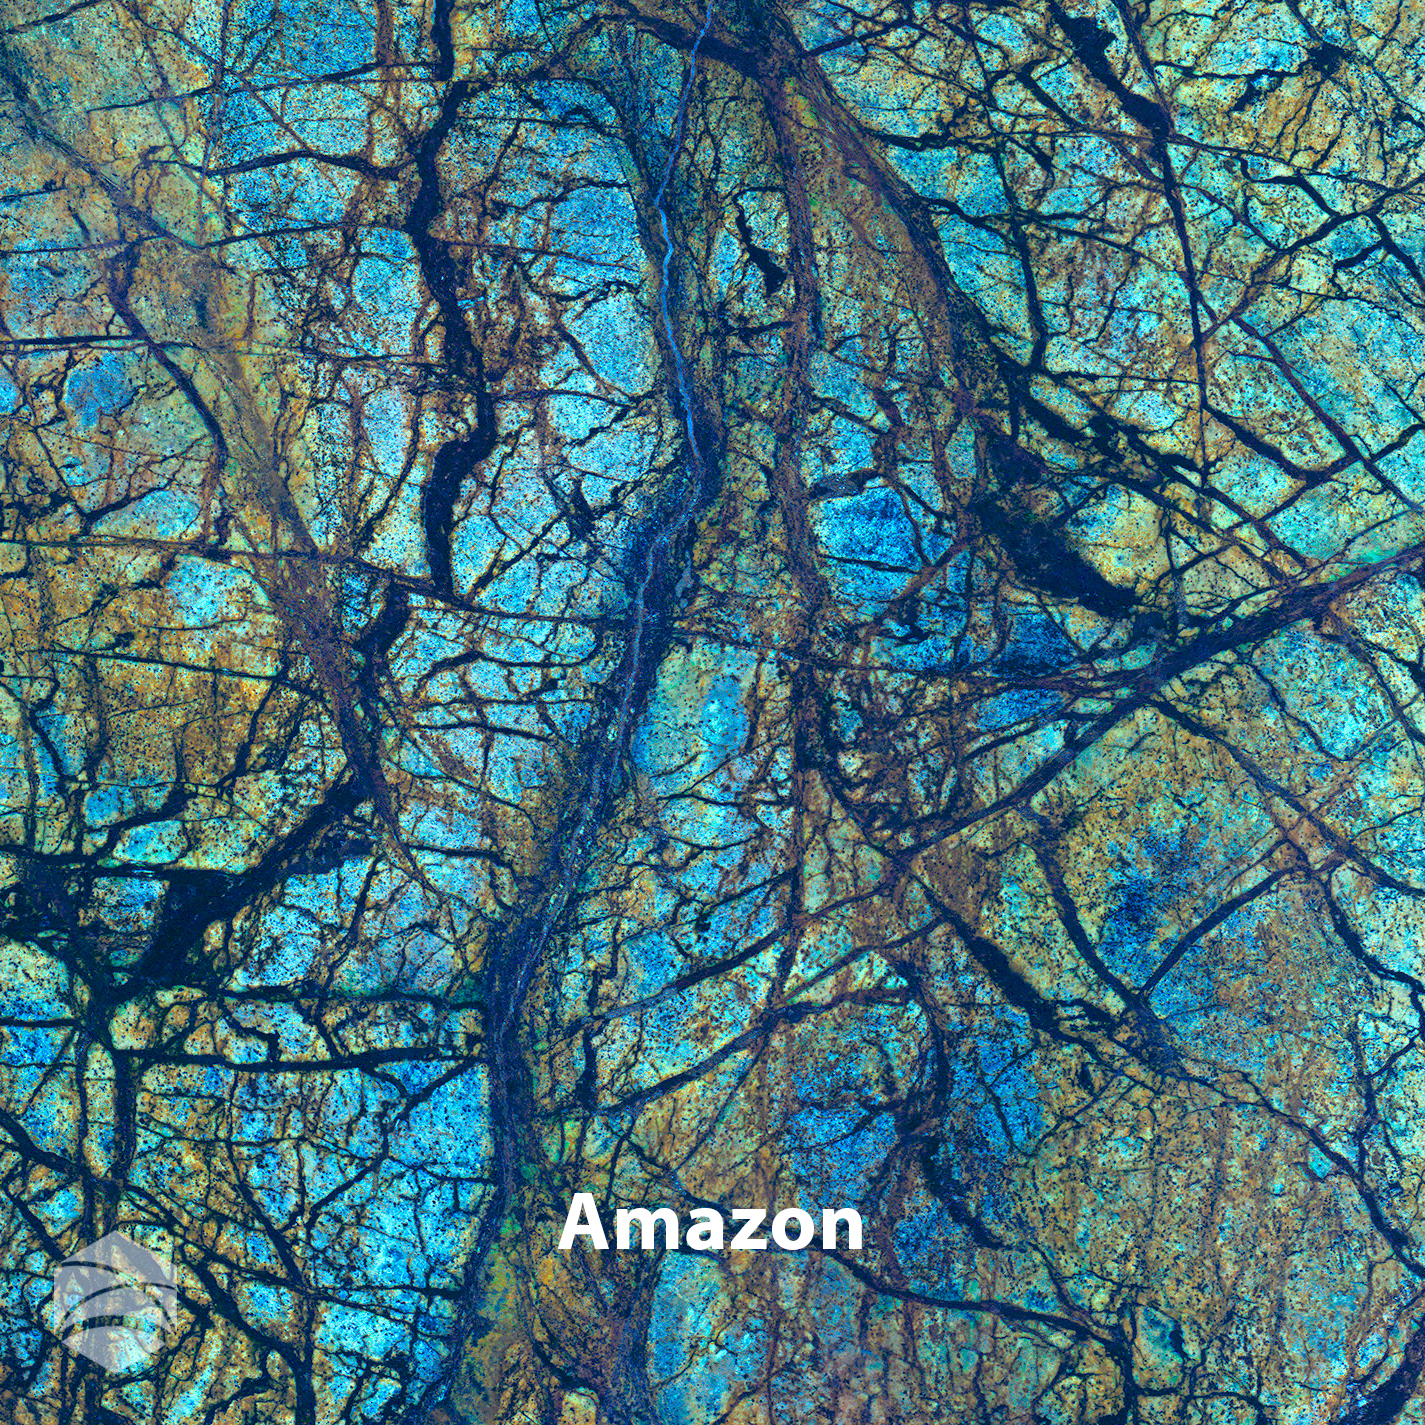 Amazon_V2_14x14.jpg